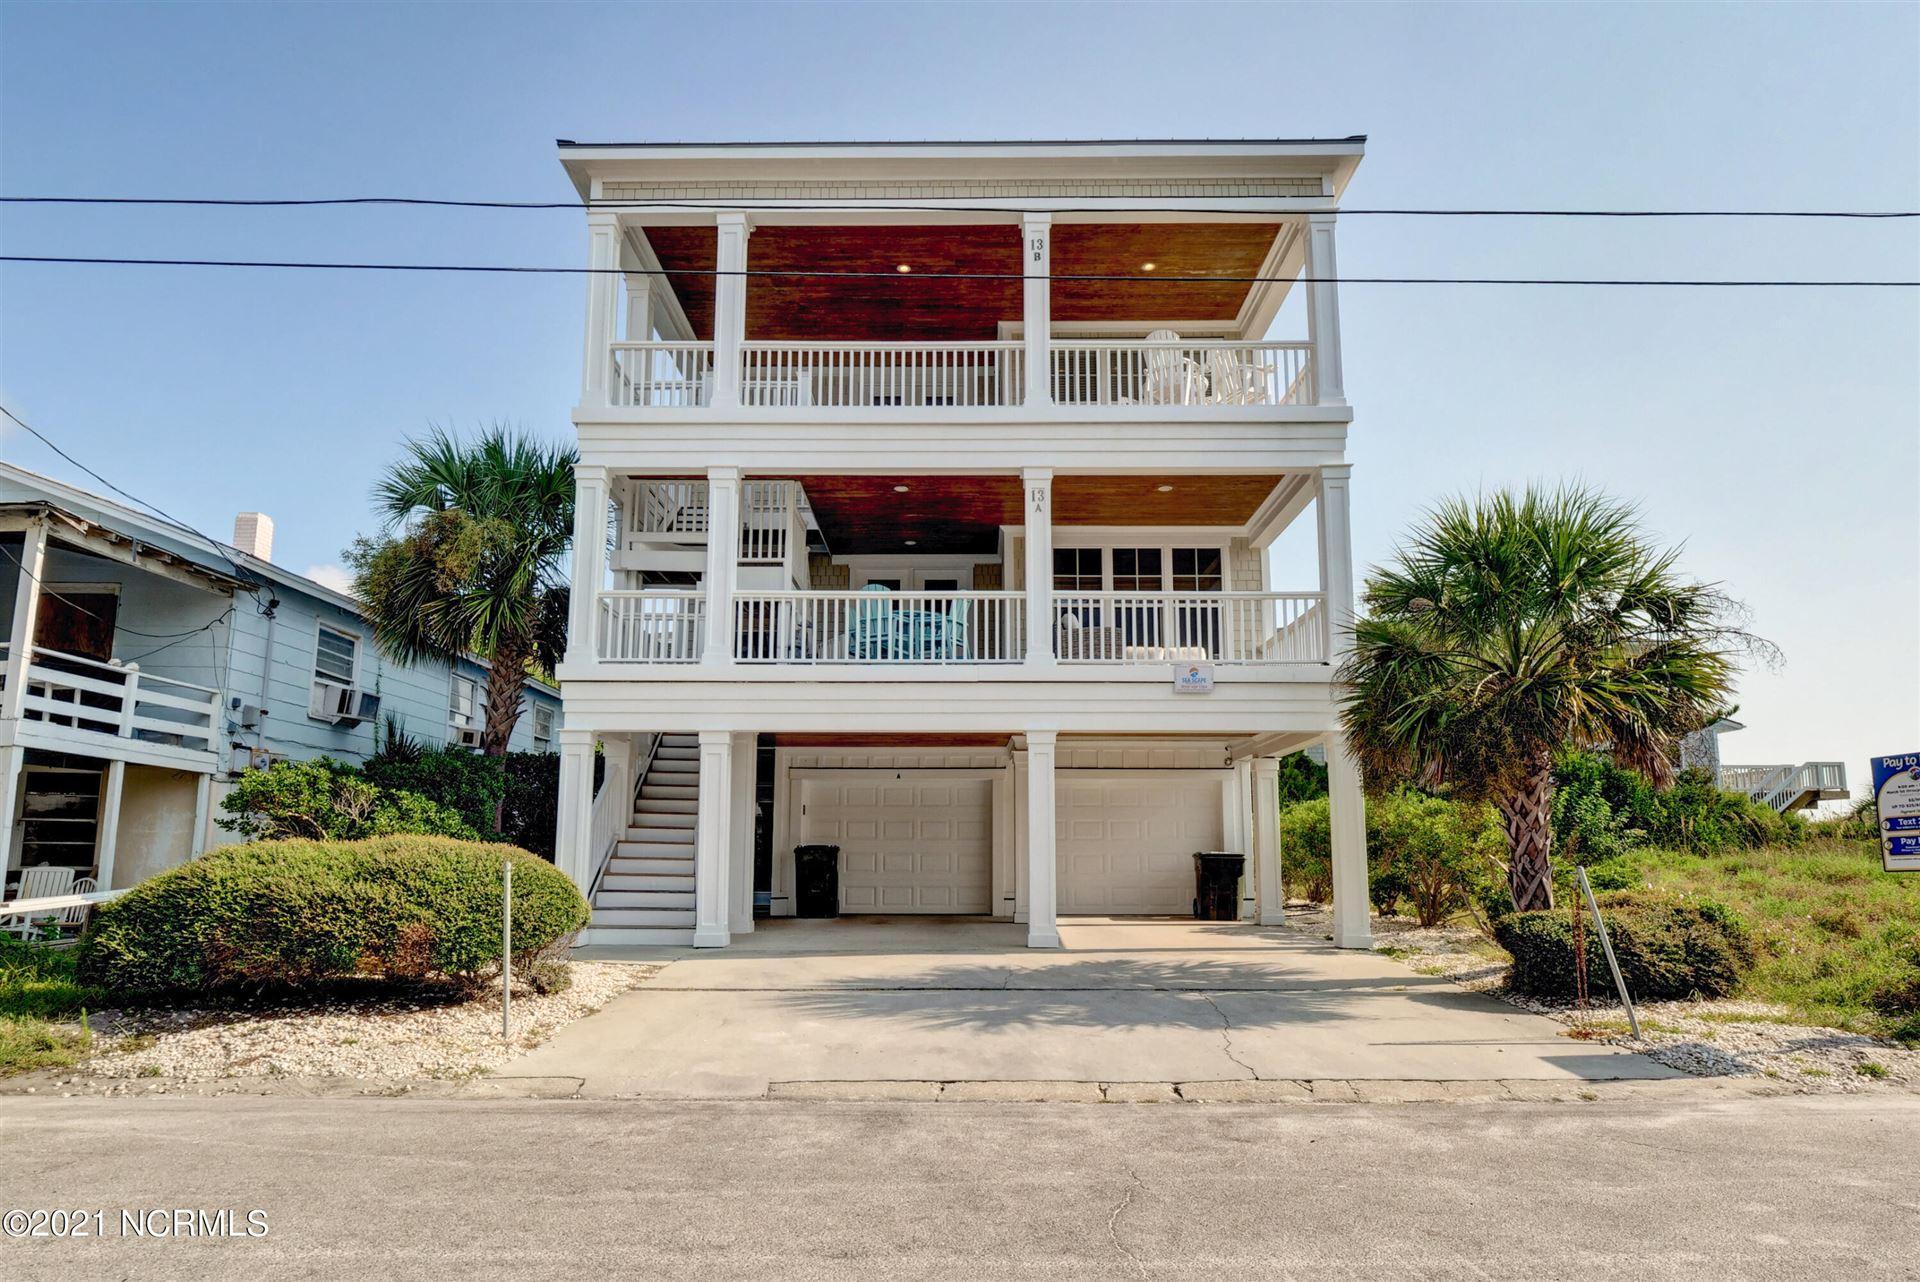 Photo of 13 Seagull Street #B, Wrightsville Beach, NC 28480 (MLS # 100292094)